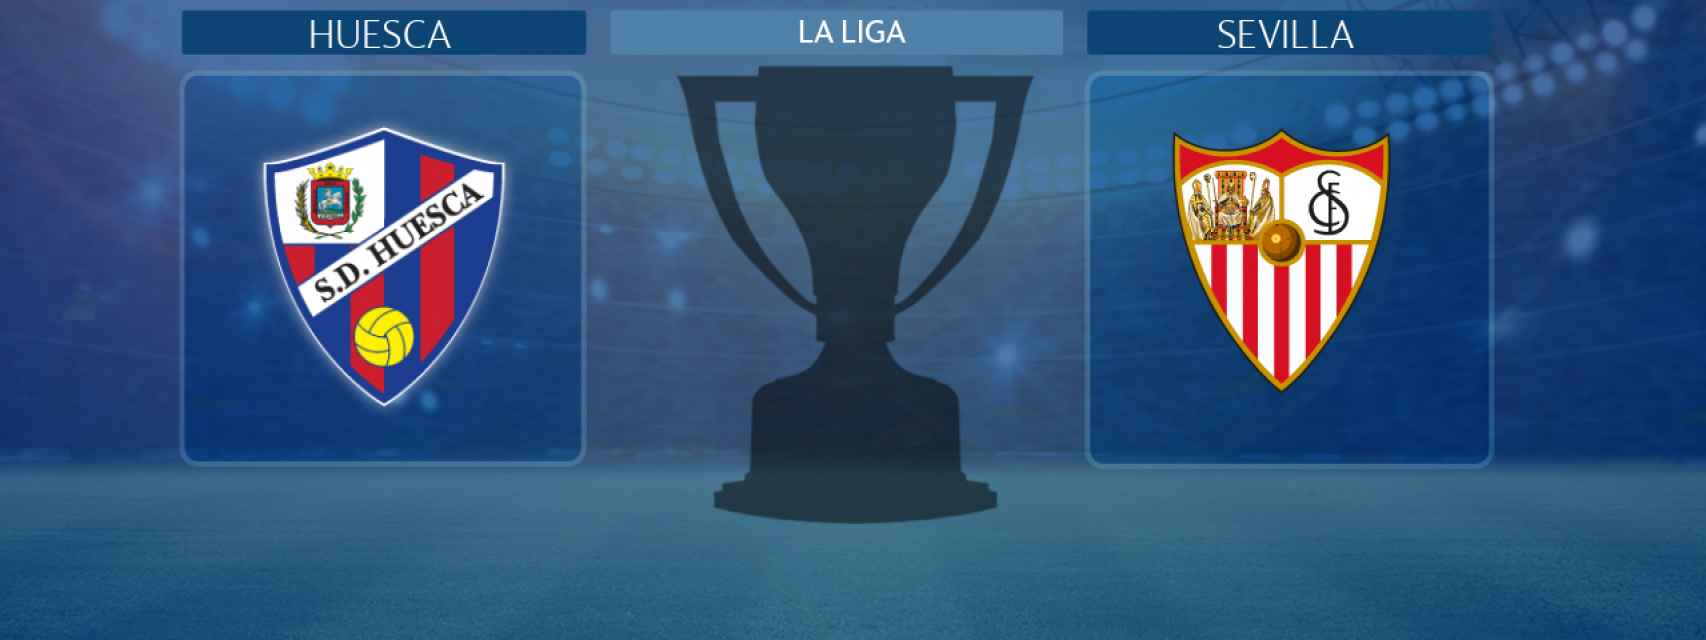 Huesca - Sevilla, partido de La Liga